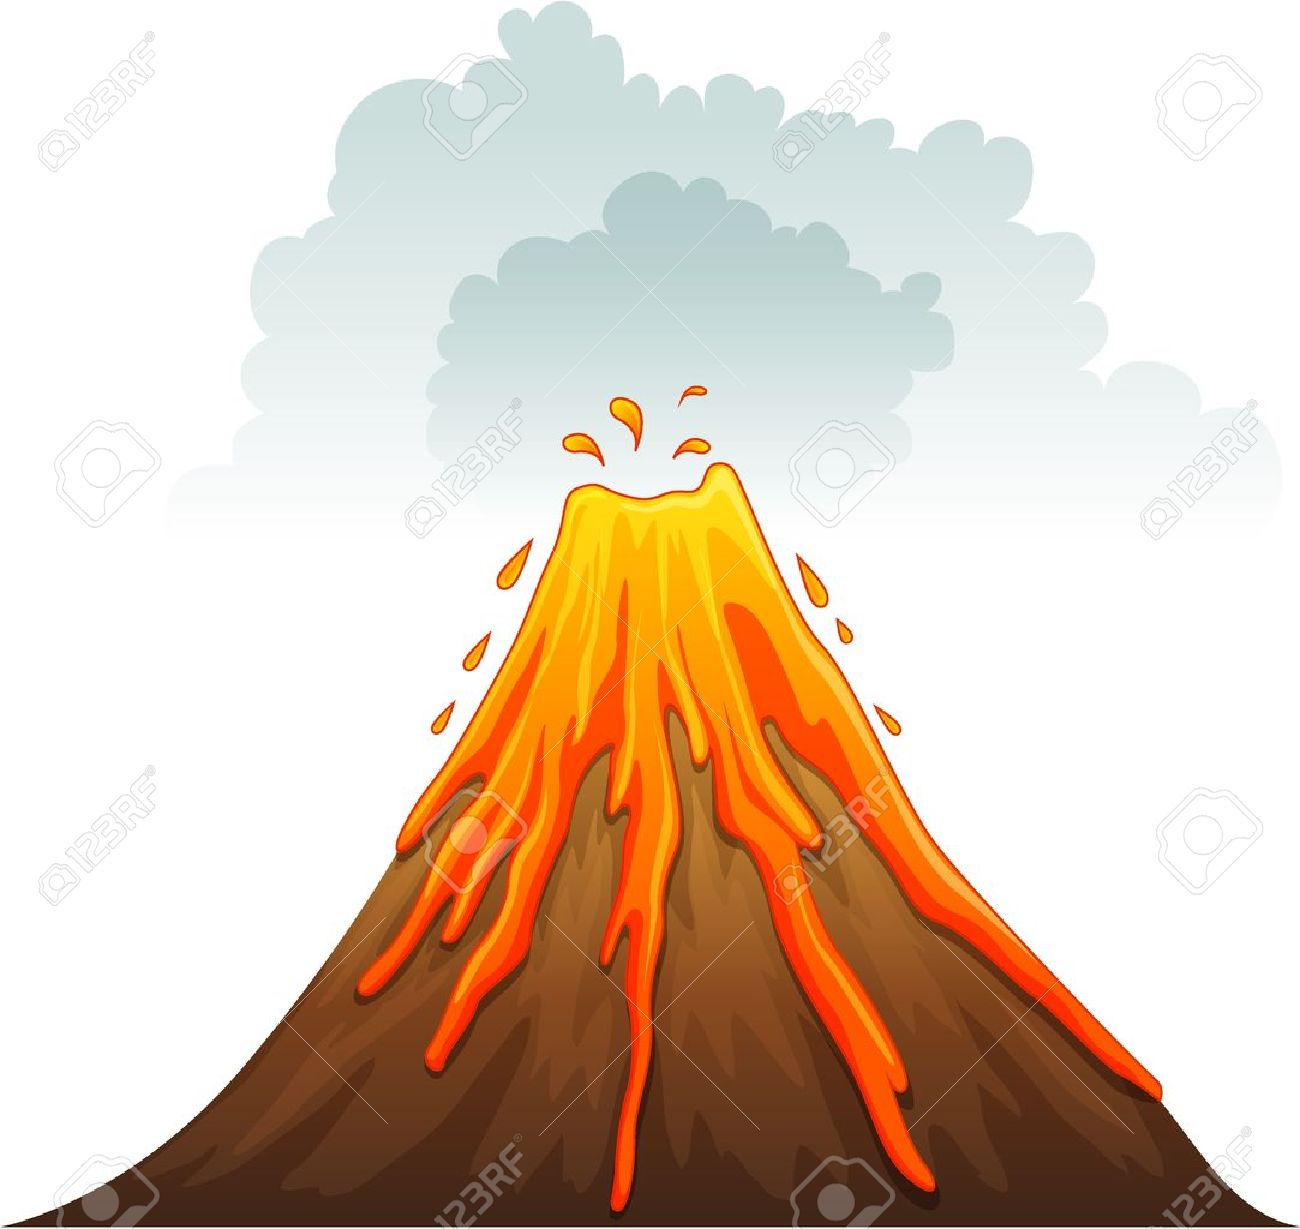 Valcaino clipart png free library 33+ Volcano Clipart | ClipartLook png free library